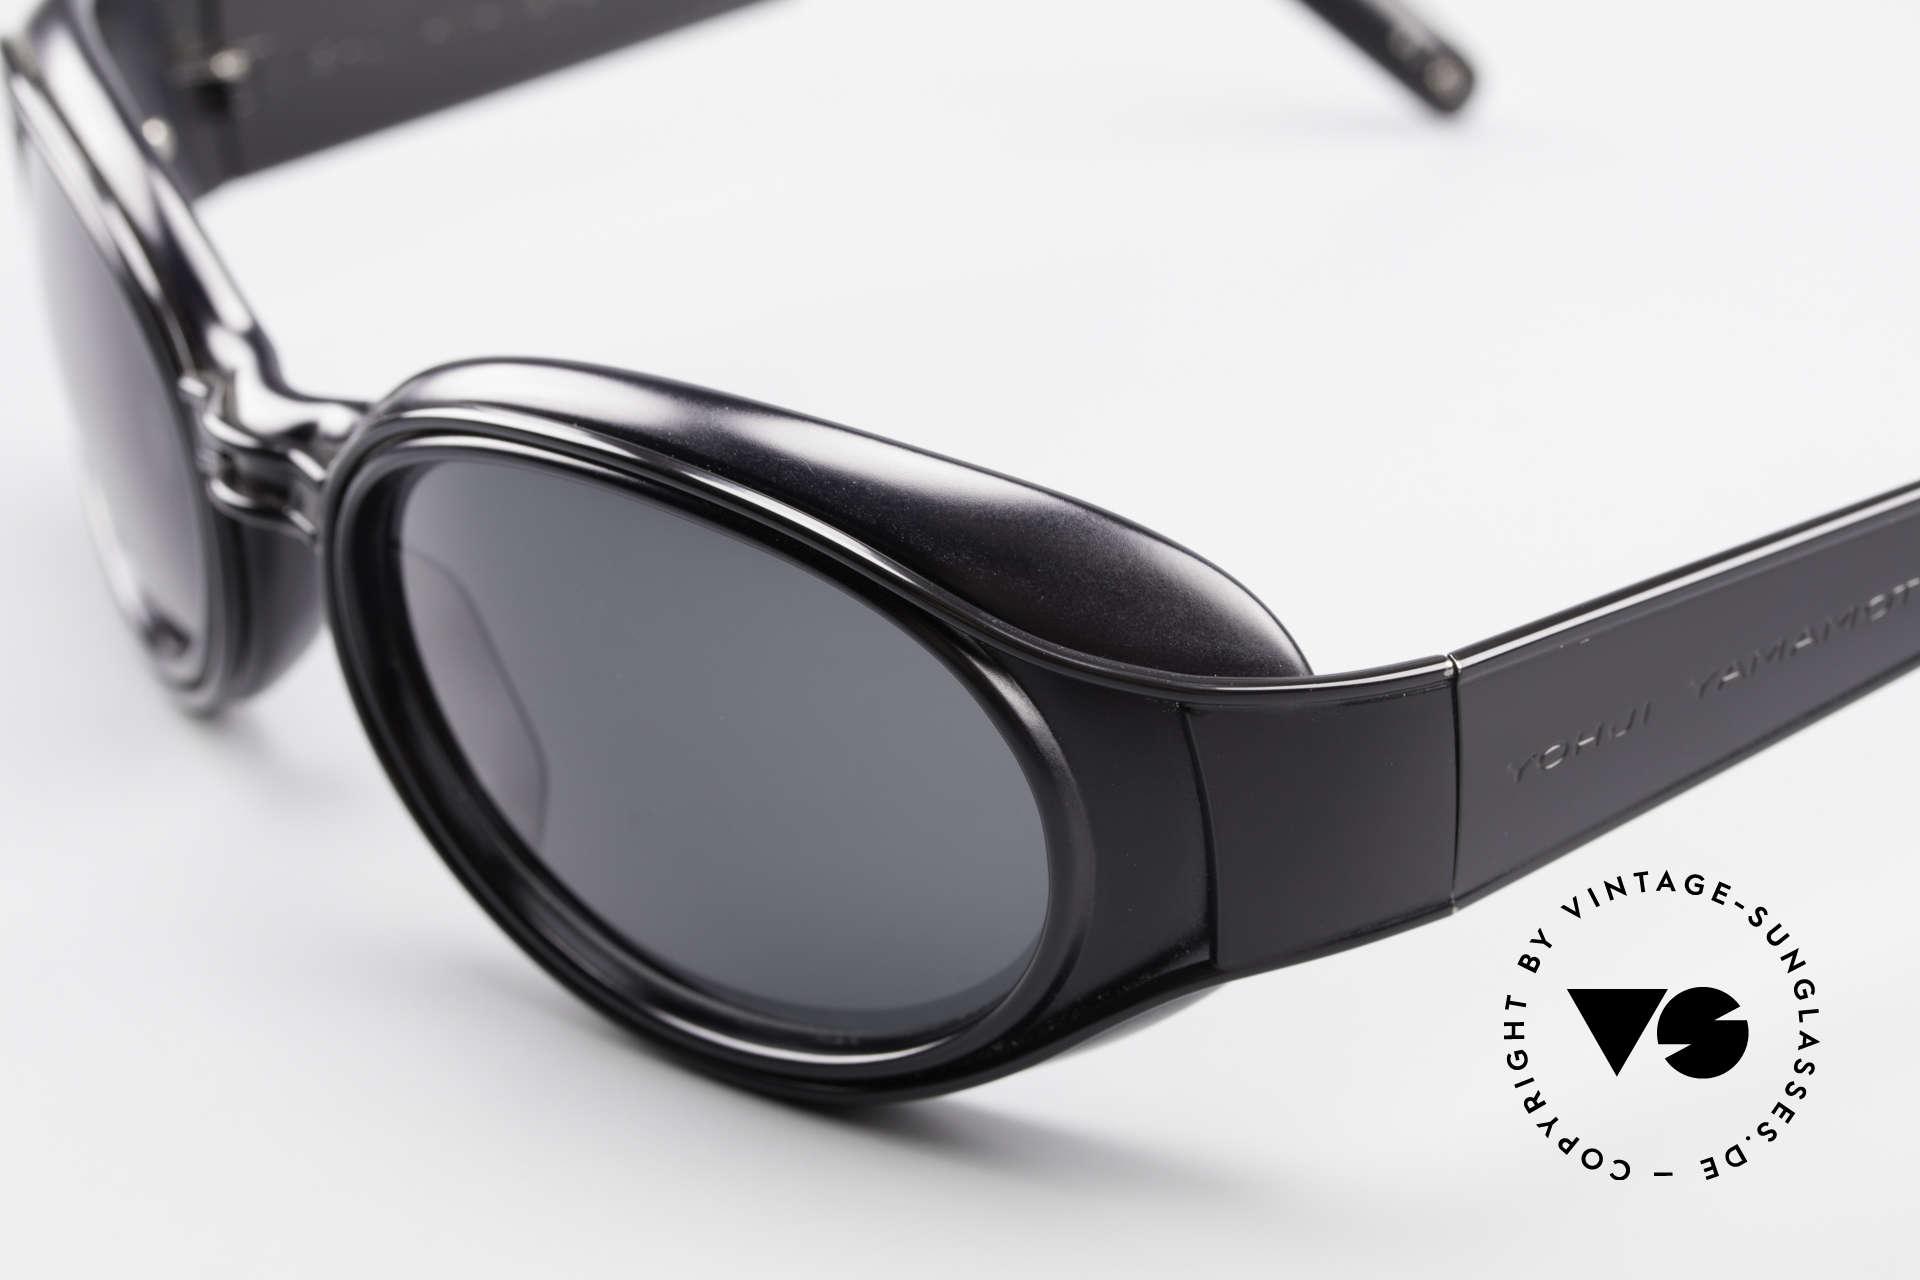 Yohji Yamamoto 52-6202 Sporty XL Designer Sunglasses, NO retro shades, but an old Yamamoto original from 1995, Made for Men and Women